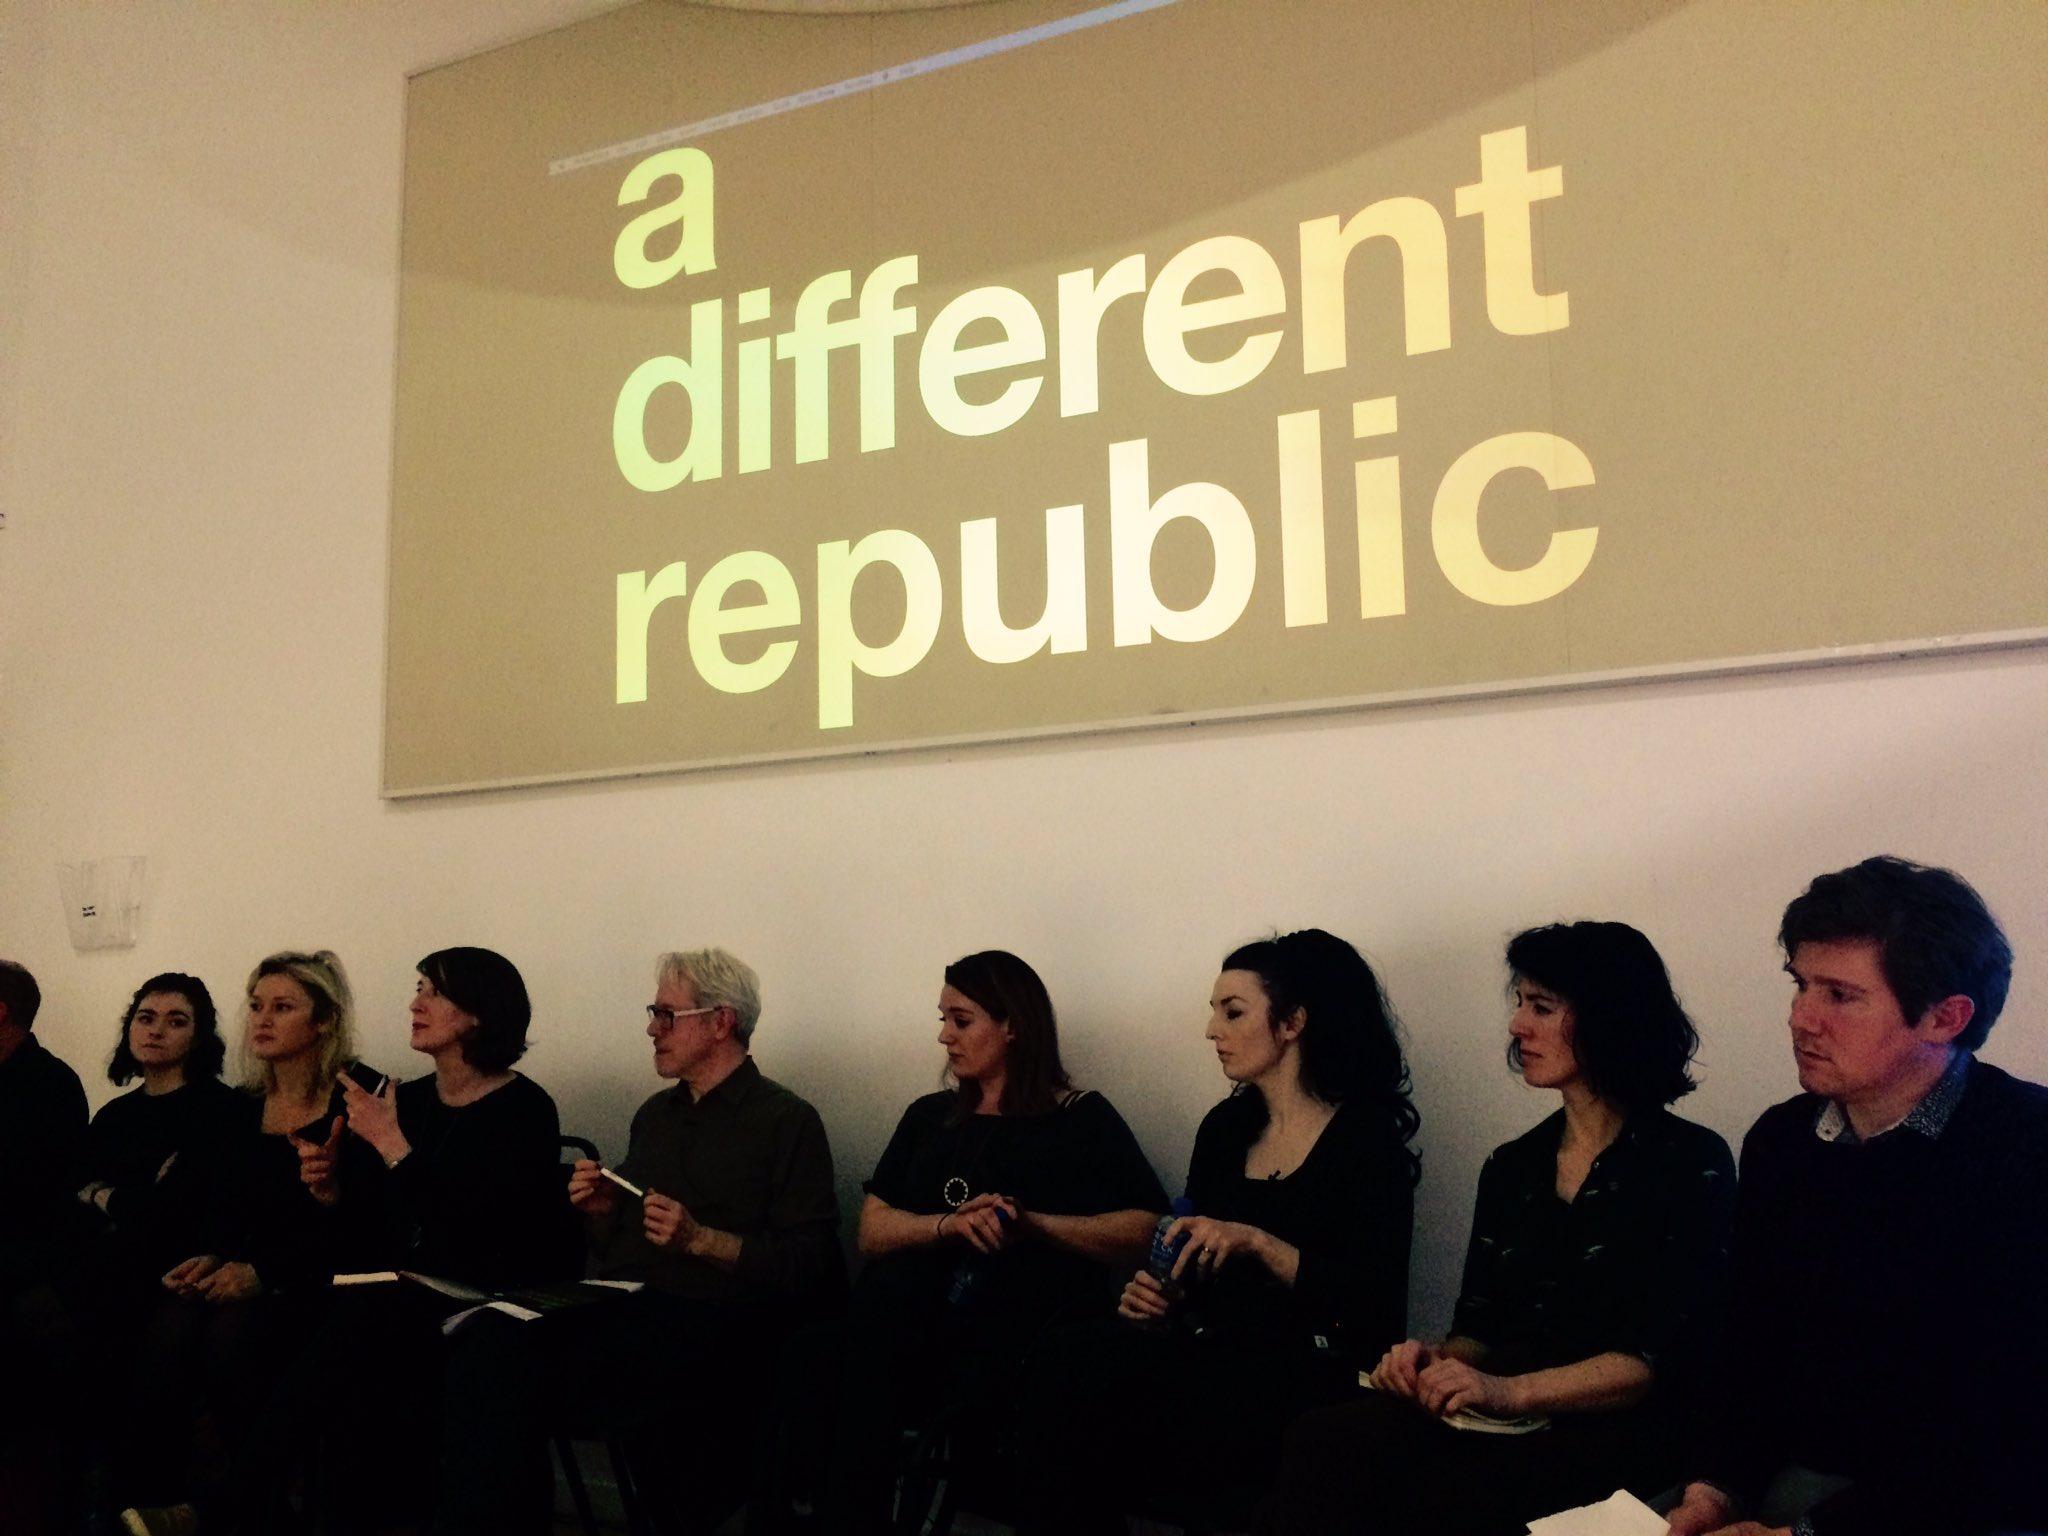 Wonderful seminar @LabDCC yesterday! @ADIarts @FSArtistStudios @janemccormick57 #adifferentrepublic https://t.co/eaFDZUbYkW